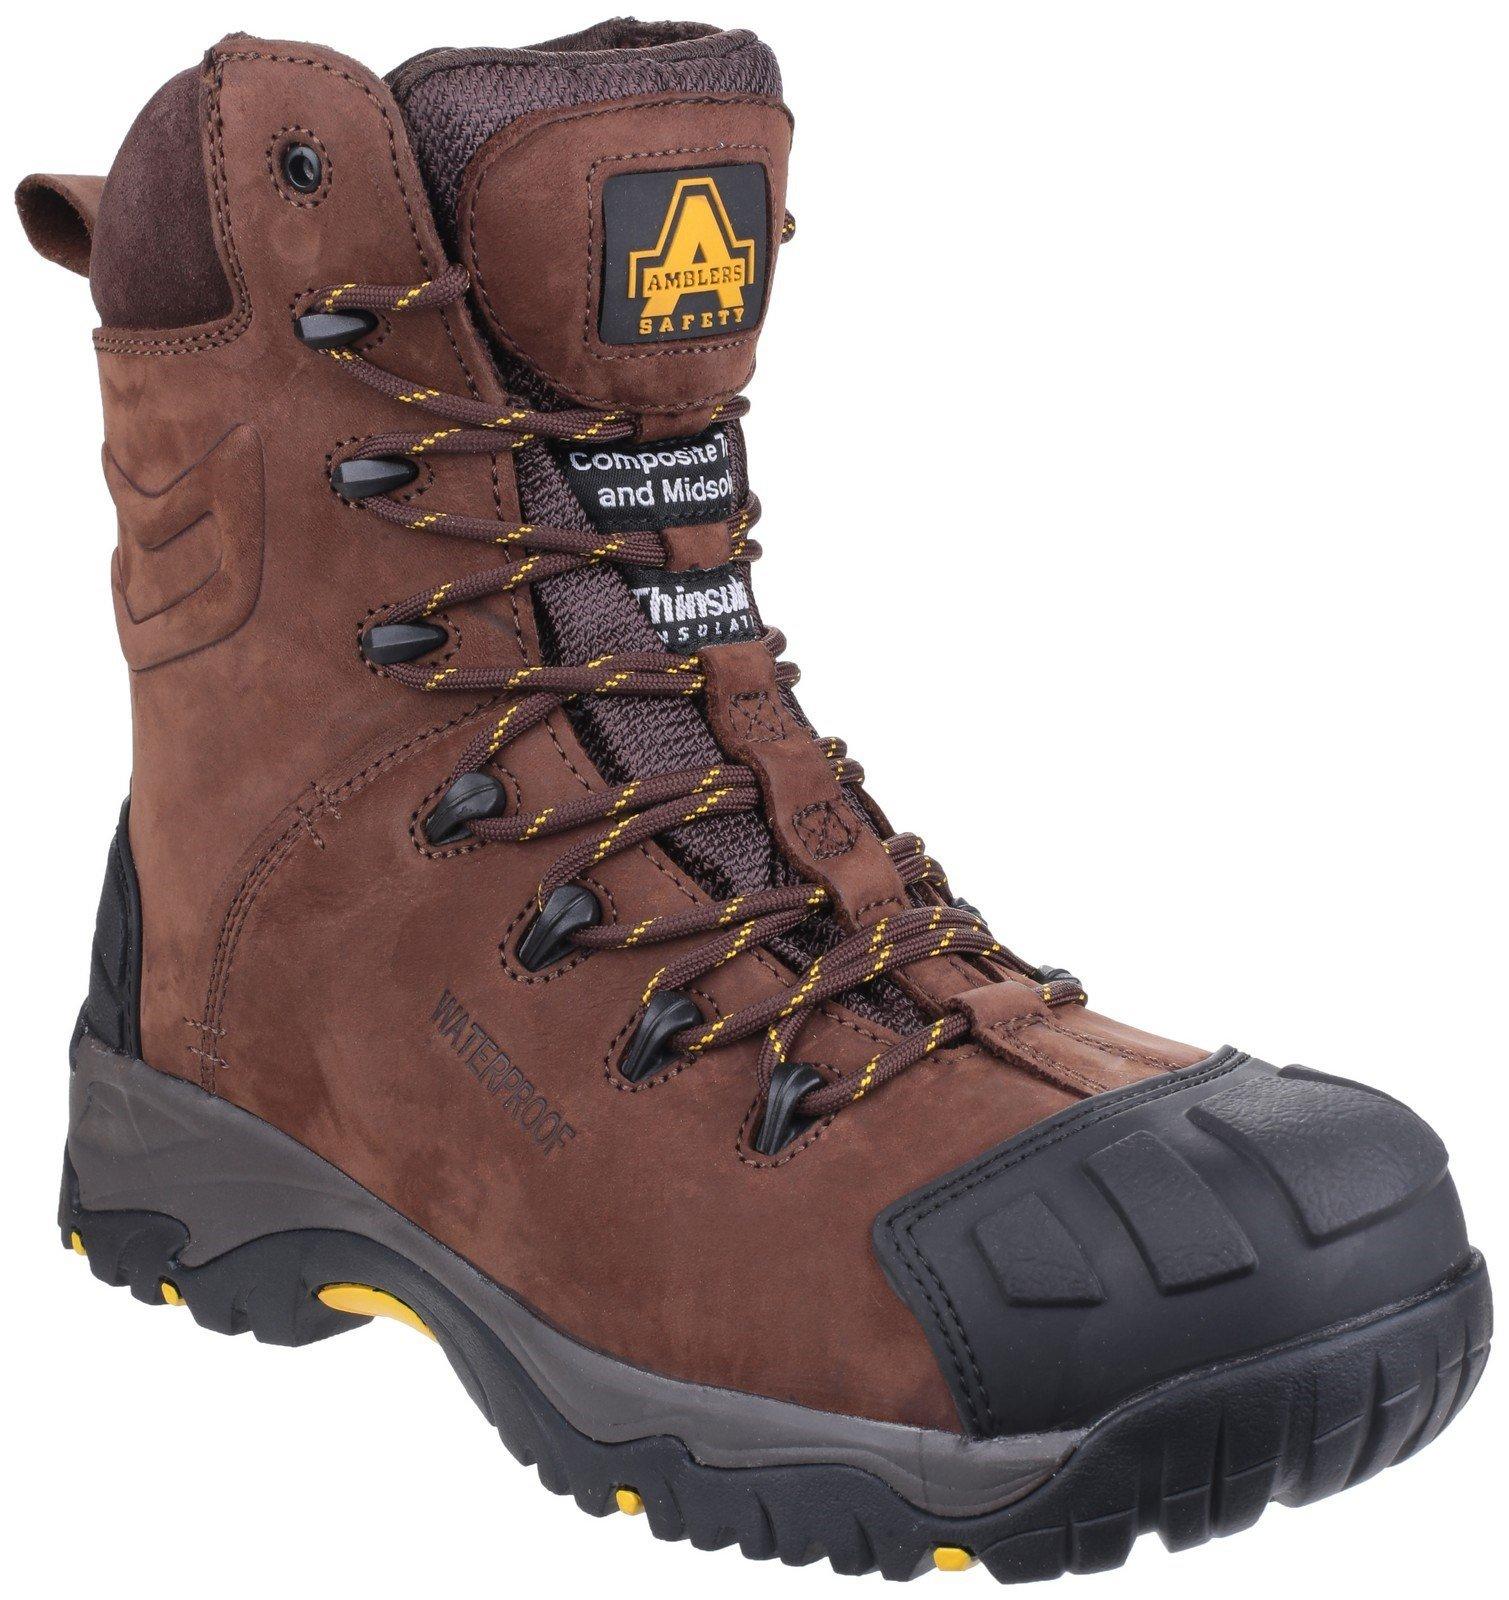 Amblers Unisex Safety Pillar Waterproof Hi-leg Lace up Boot Brown 24196 - Brown 6